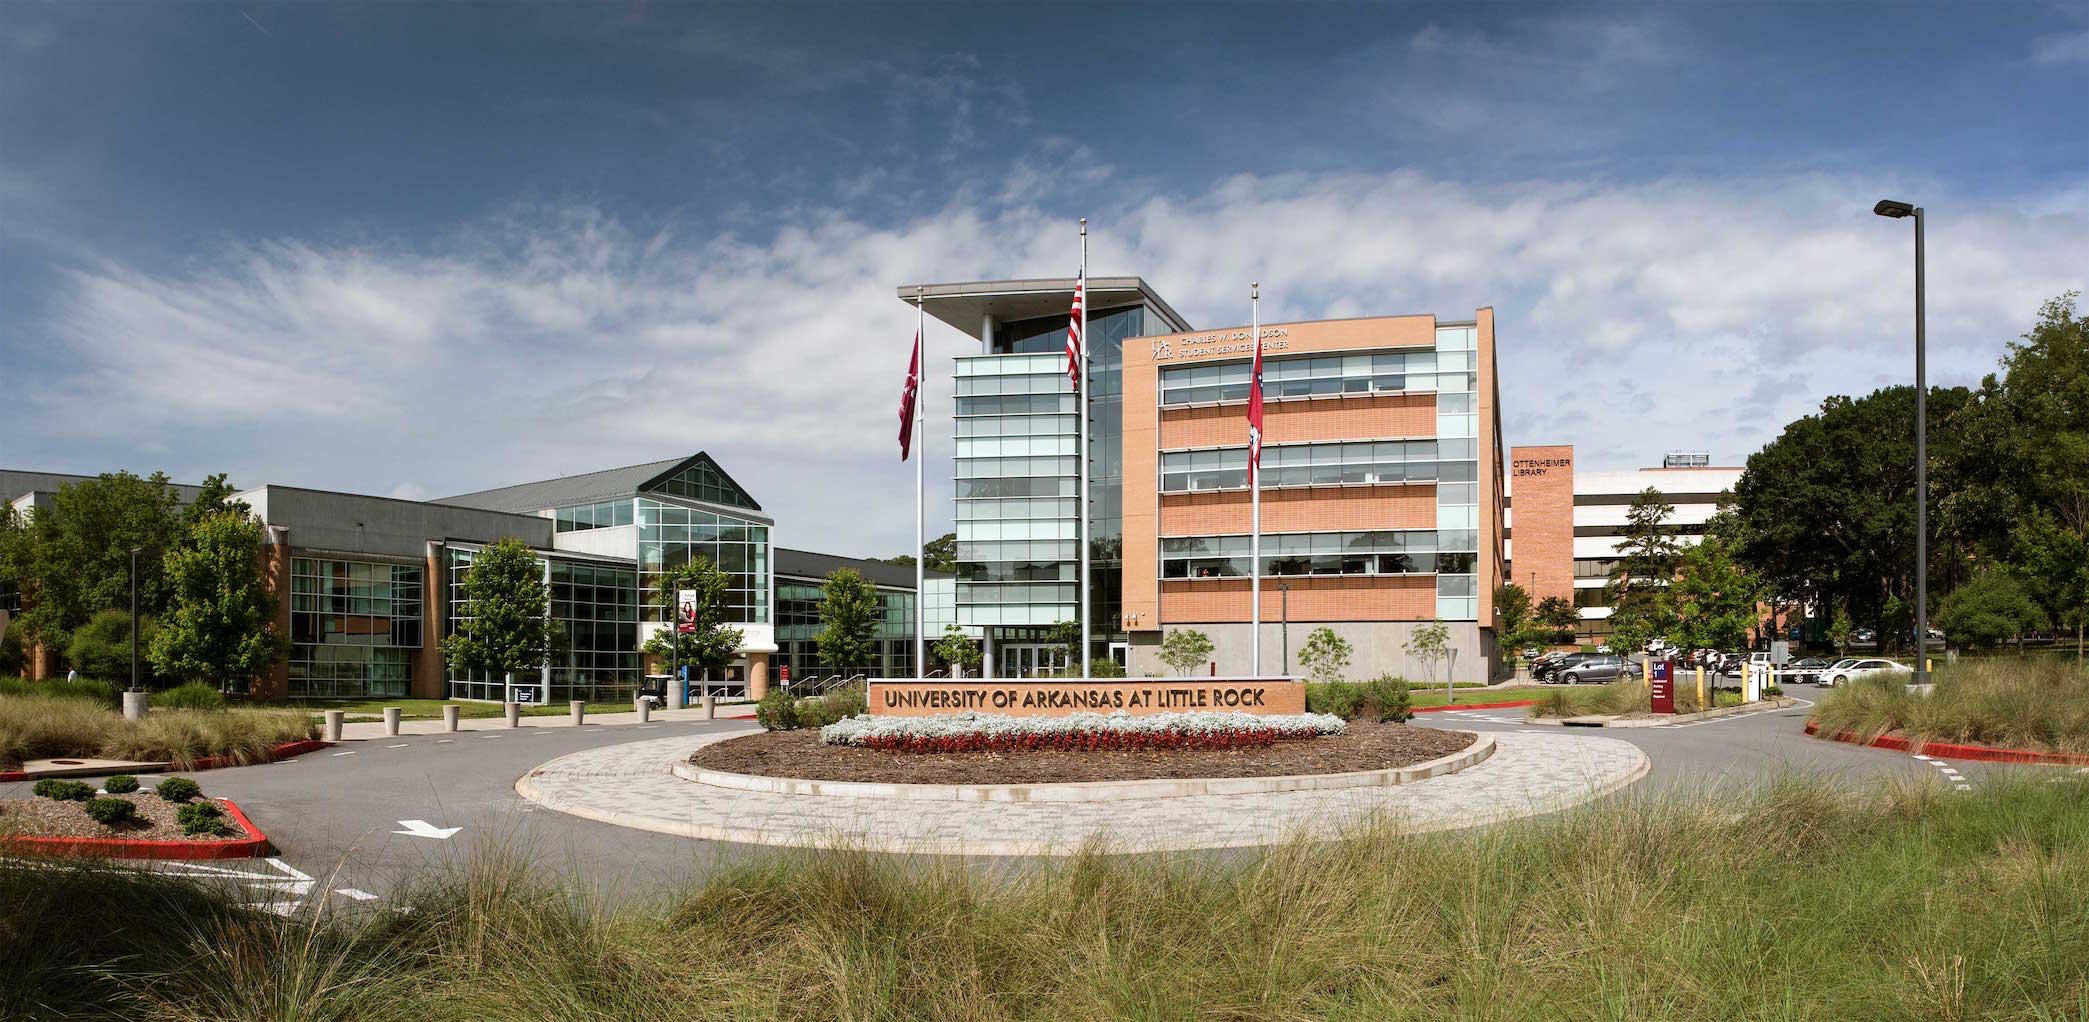 University of Arkansas at Little Rock Picture